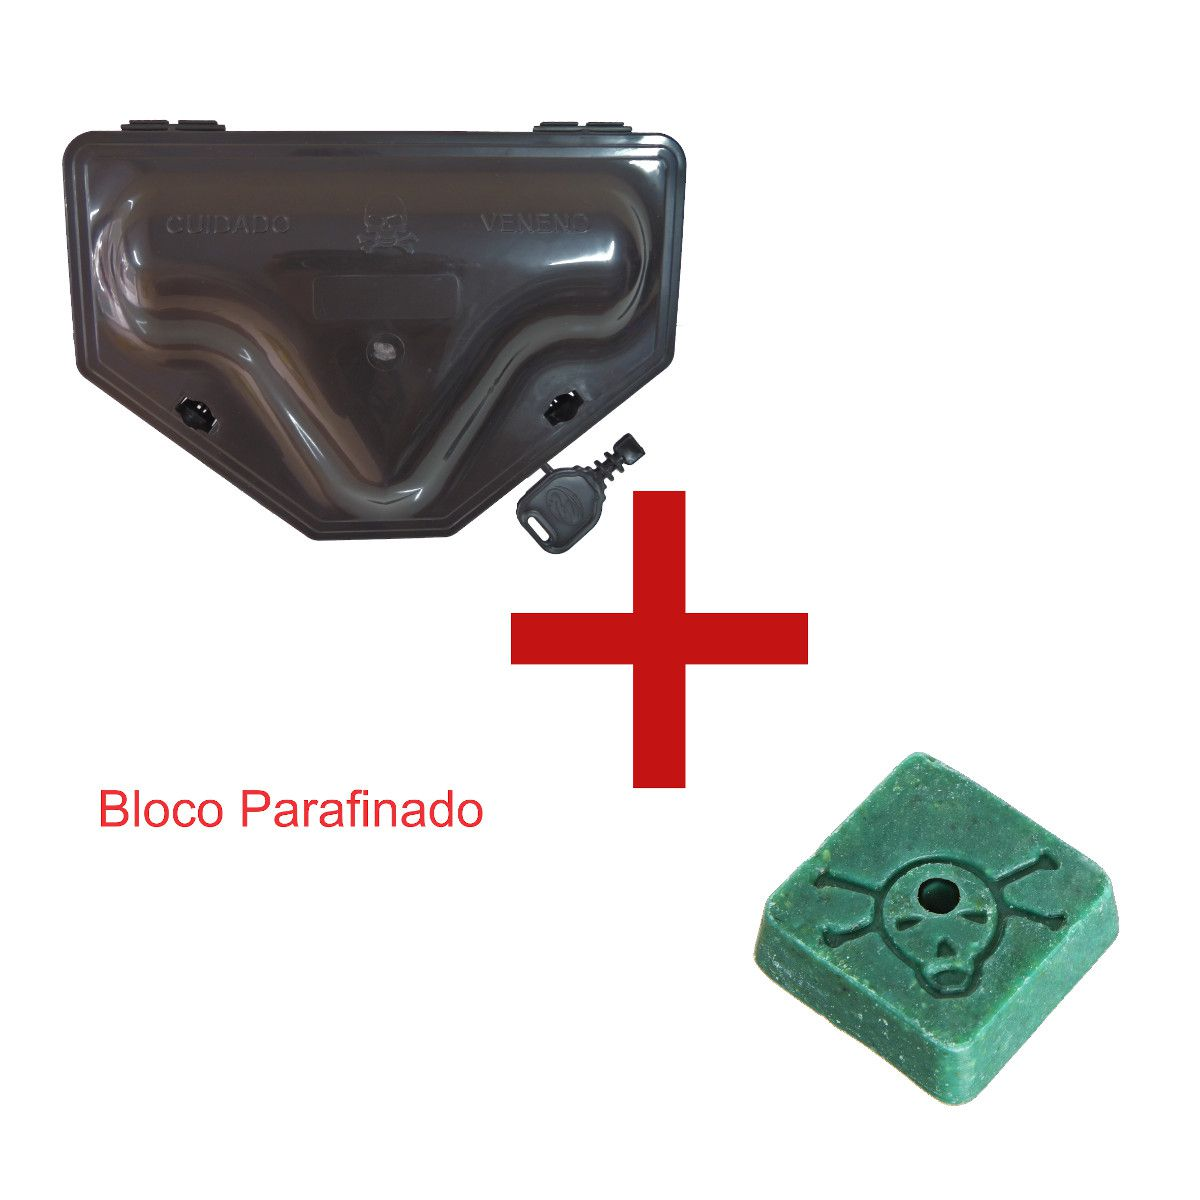 KIT 14 Porta Iscas Reforçado Ratoeira 2 TRAVAS Chave p/Ratos